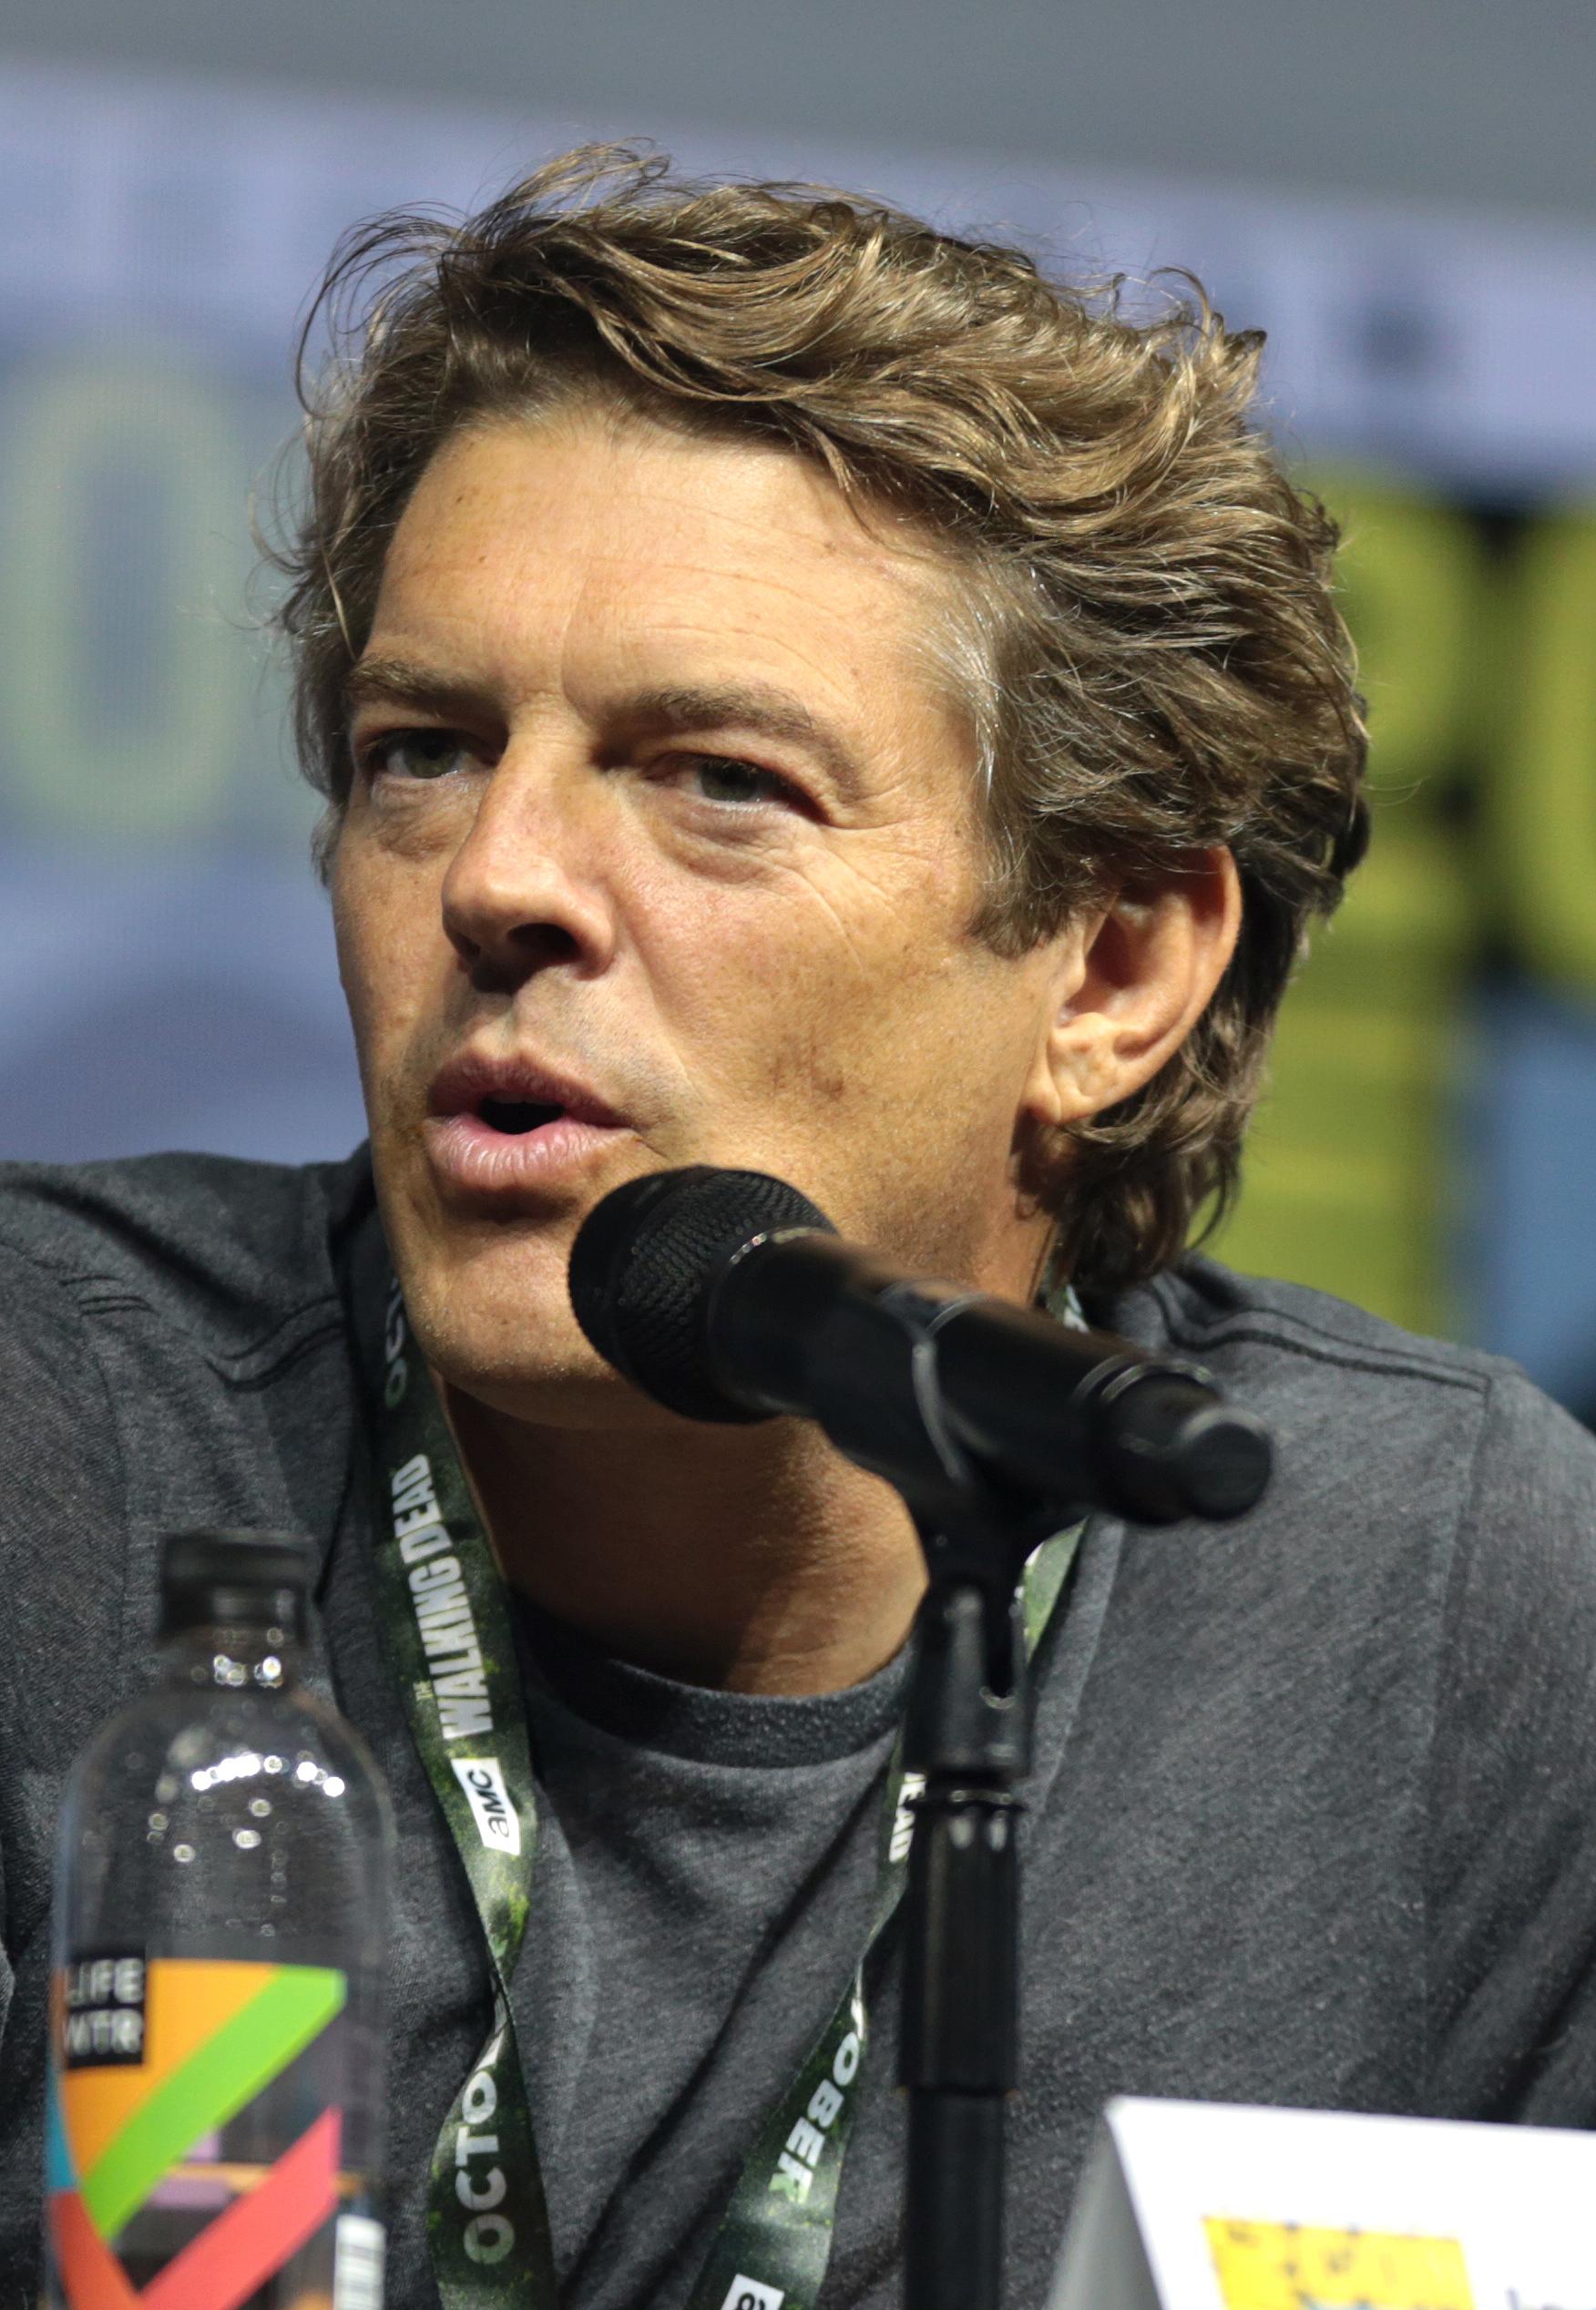 Blum at the 2018 [[San Diego Comic-Con]]